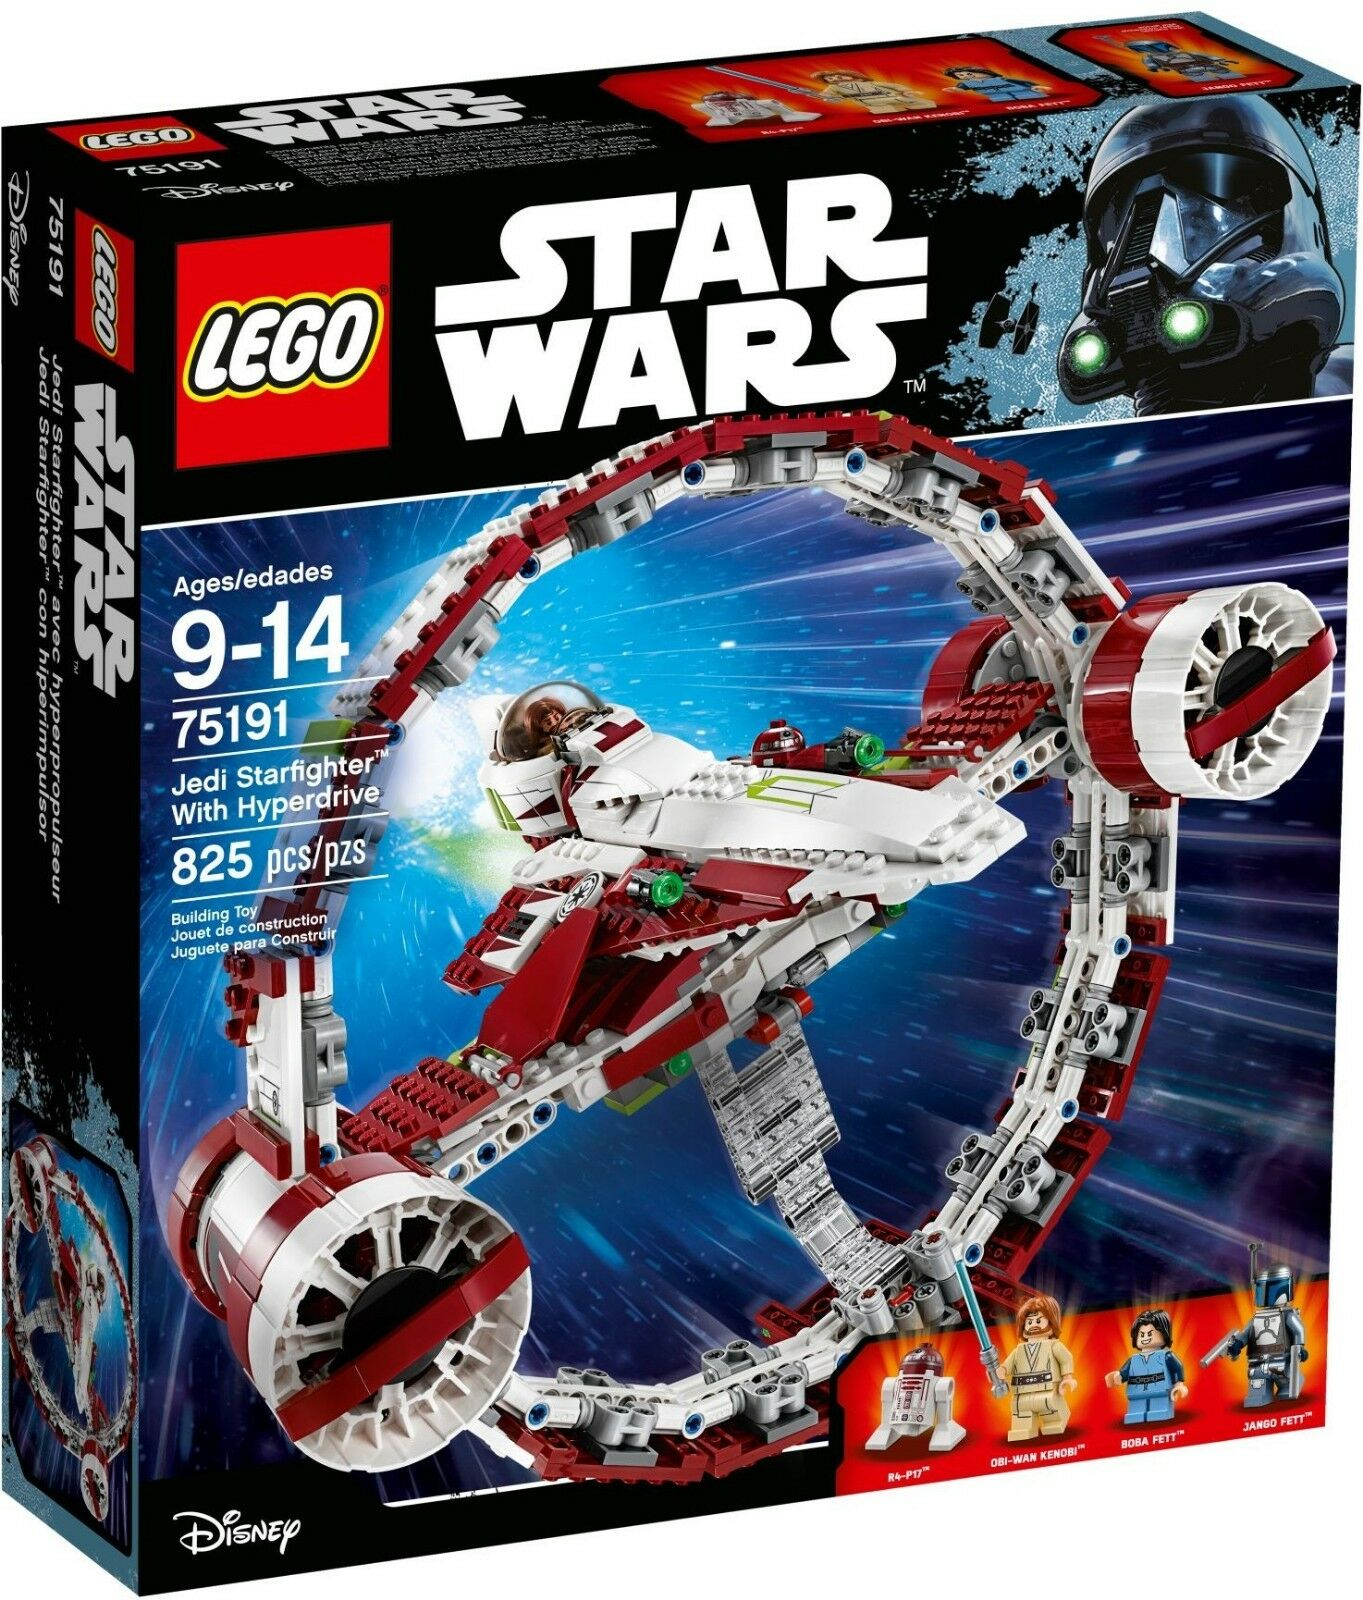 Lego Star Wars - 75191 - Jedi Starfighter avec hyperdrive - NEUF et Scellé